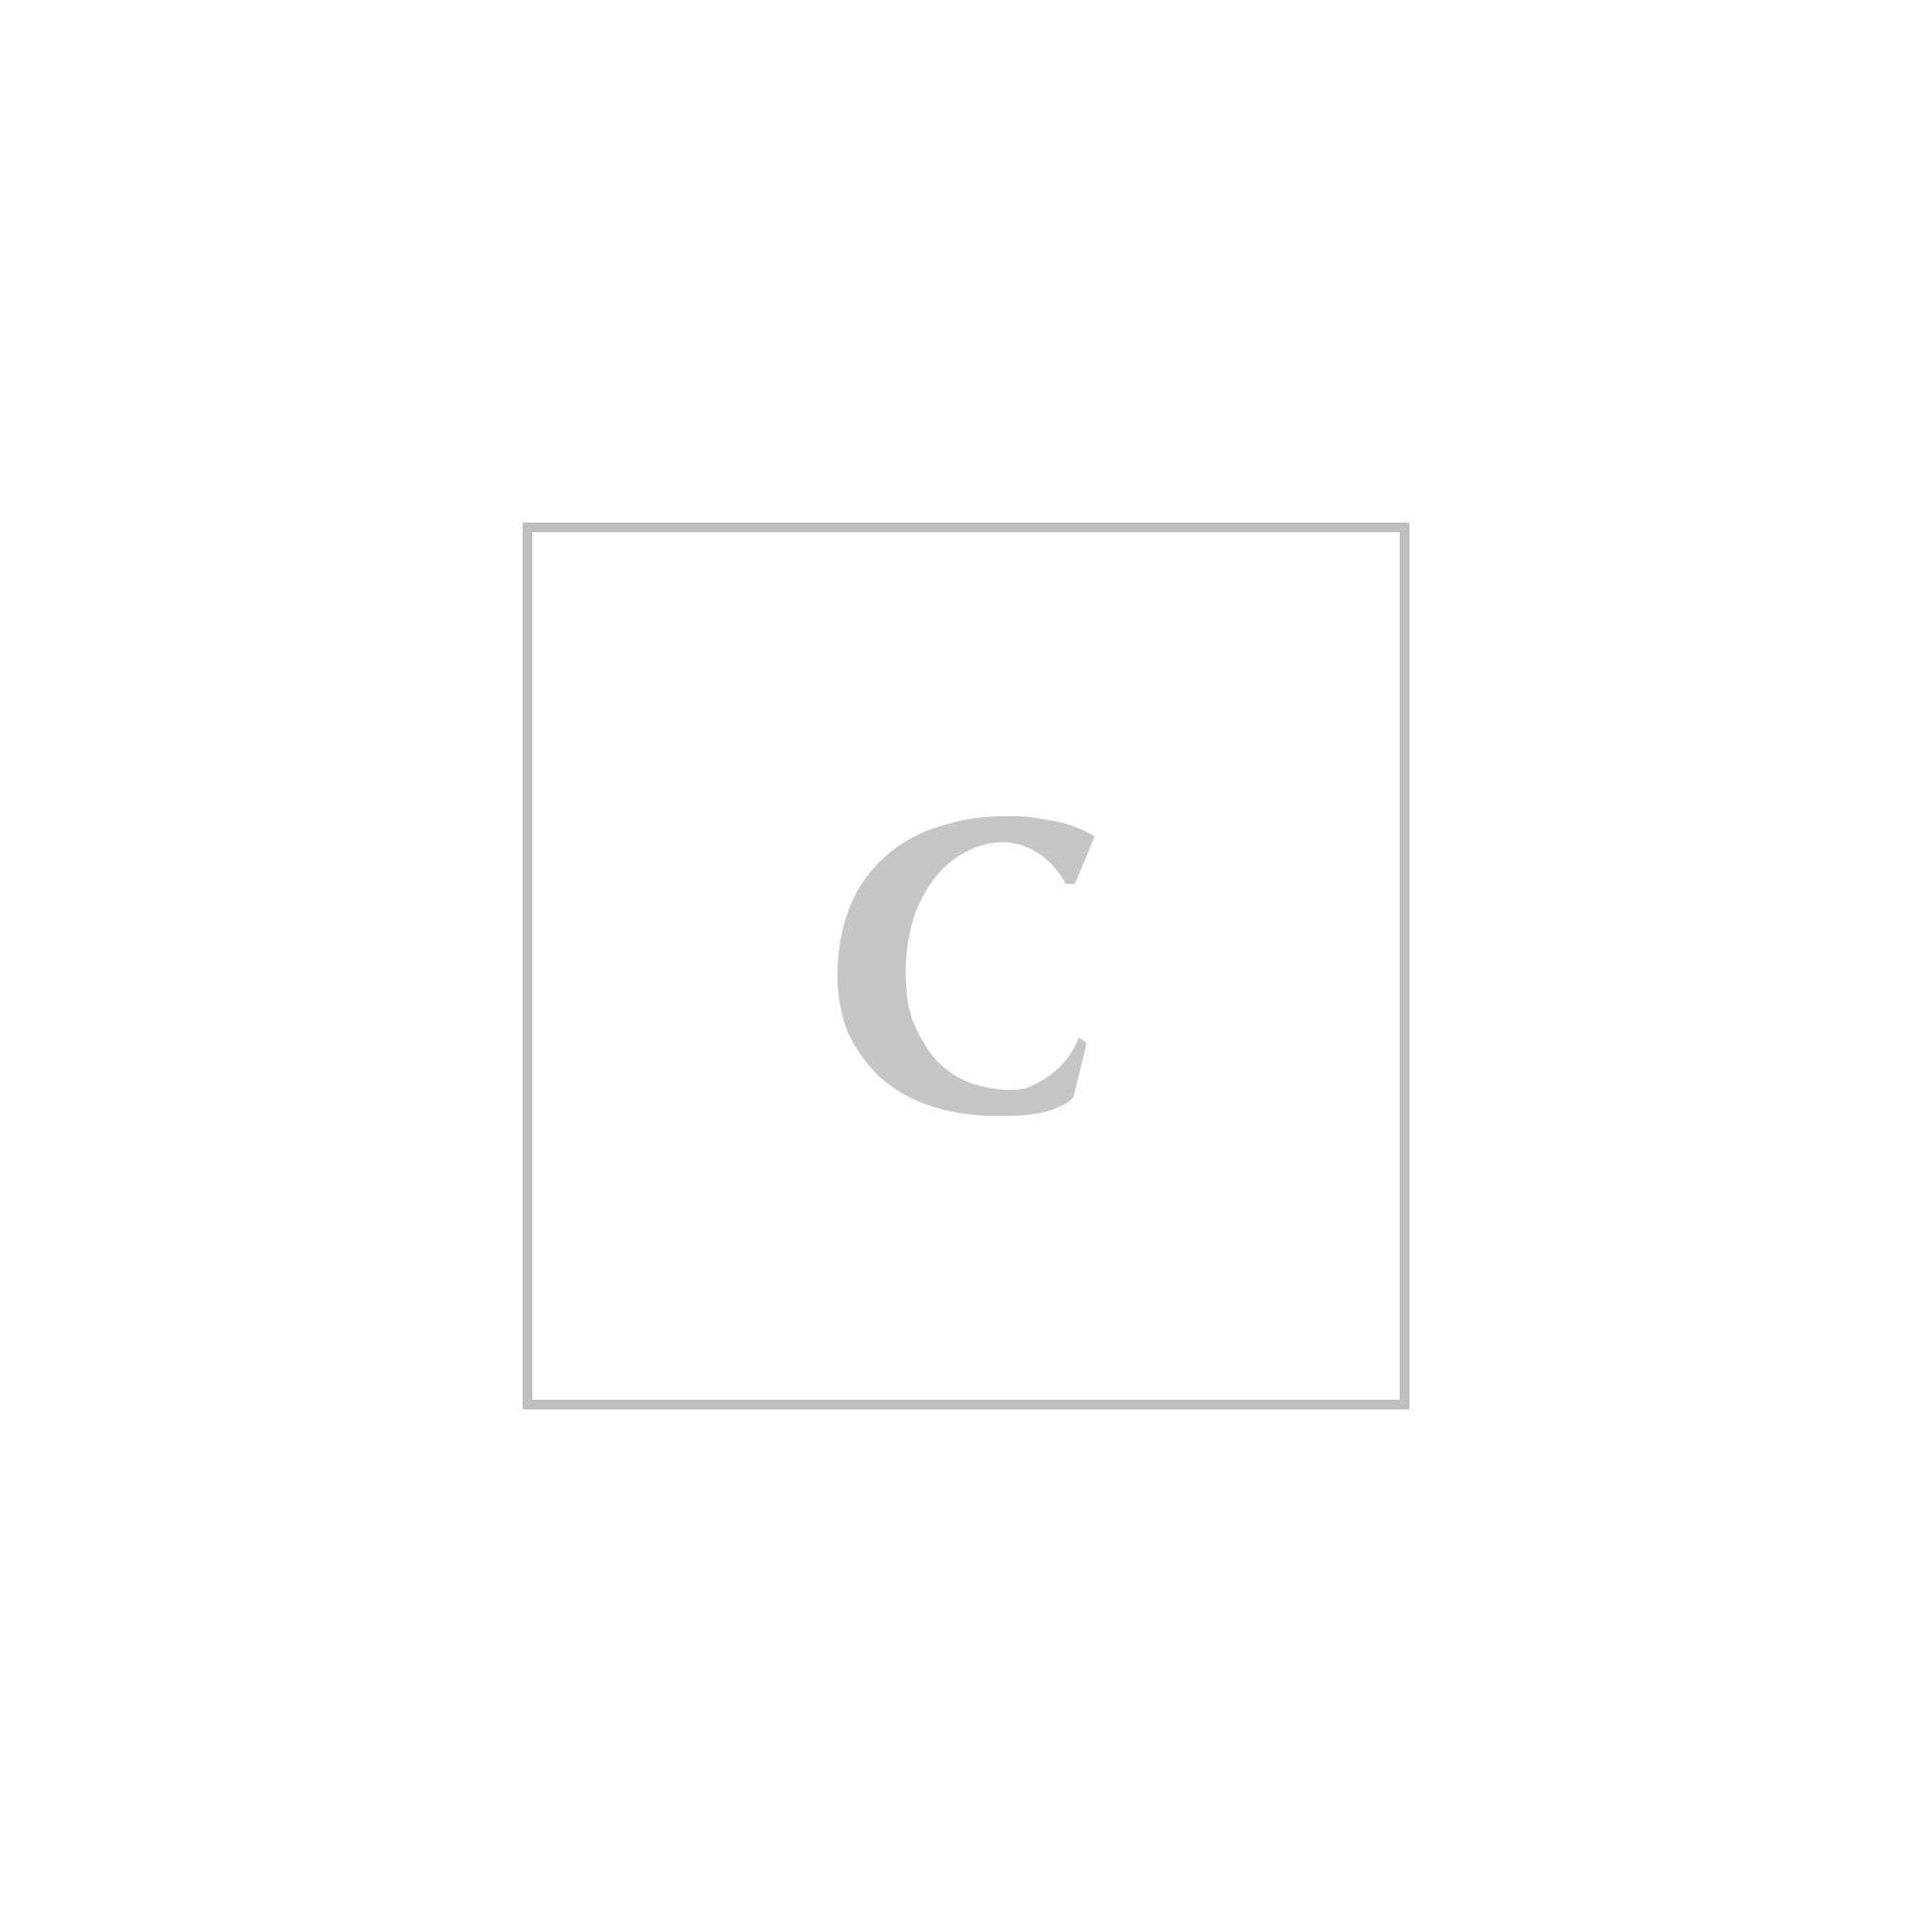 Lanvin giubbino blouson in cotton gabardine